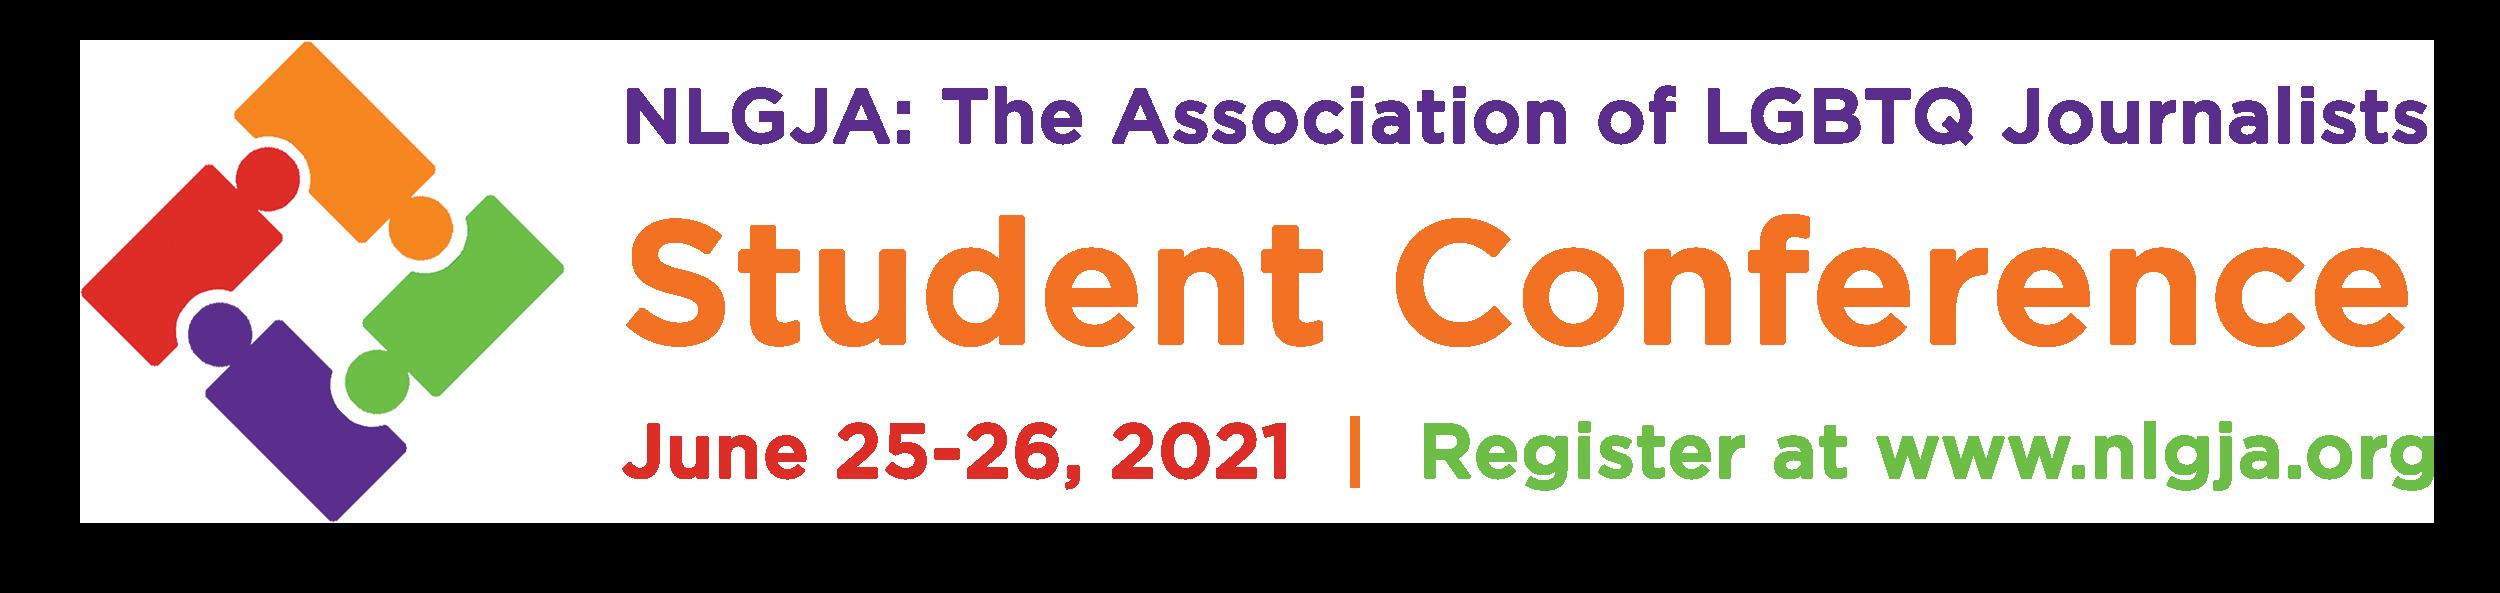 NLGJA: The Association of LGBTQ Journalists 2021 Student Website